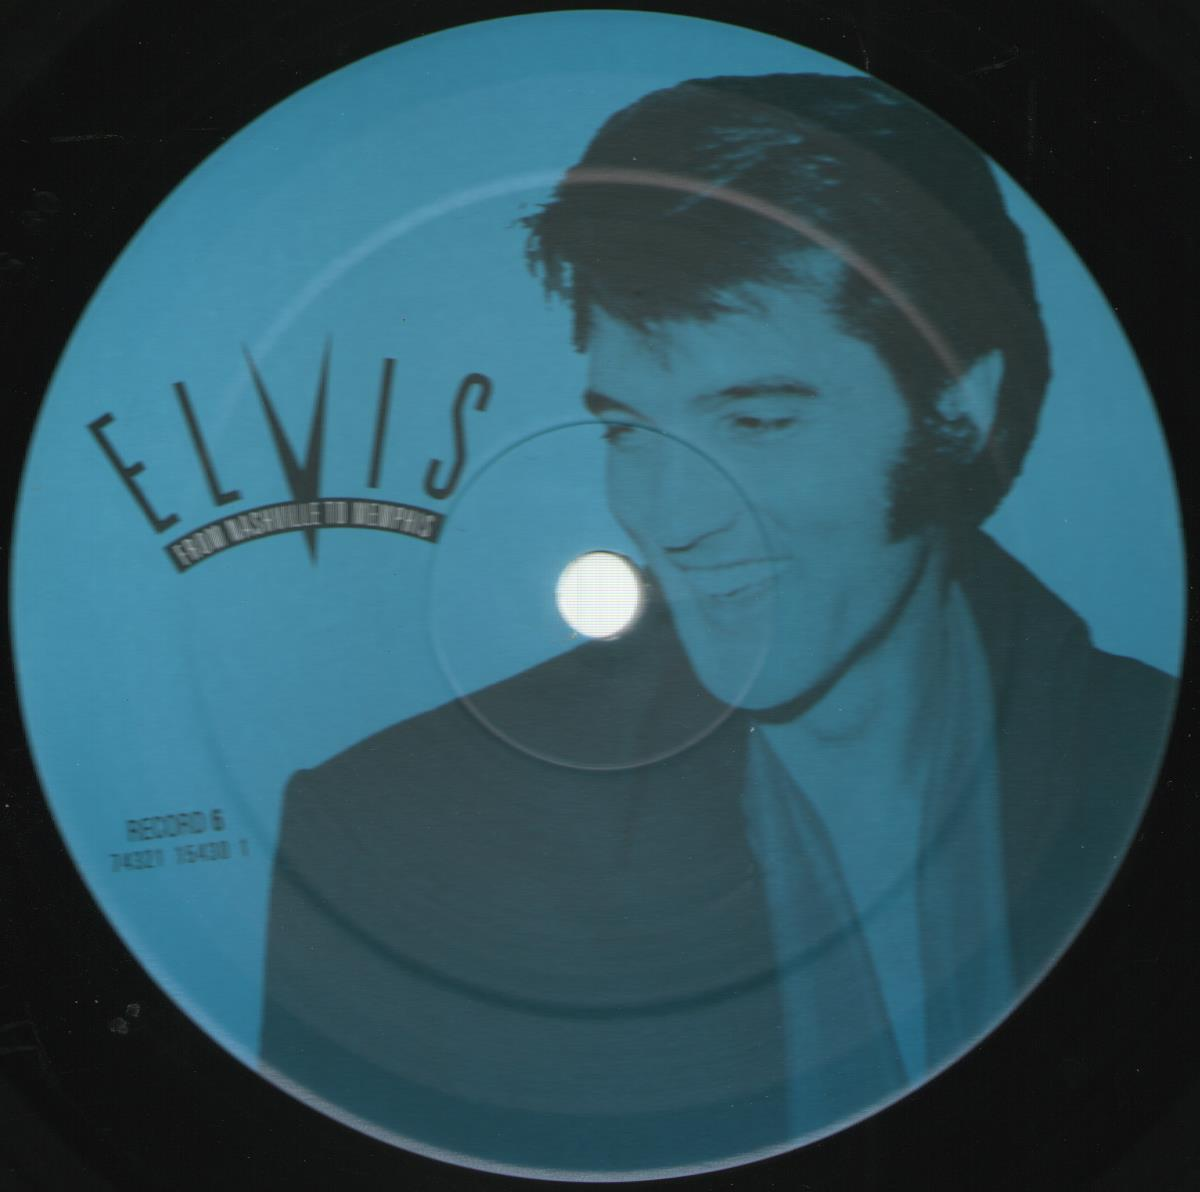 ELVIS - FROM NASHVILLE TO MEMPHIS - THE ESSENTIAL 60'S MASTERS Bild12ntofz